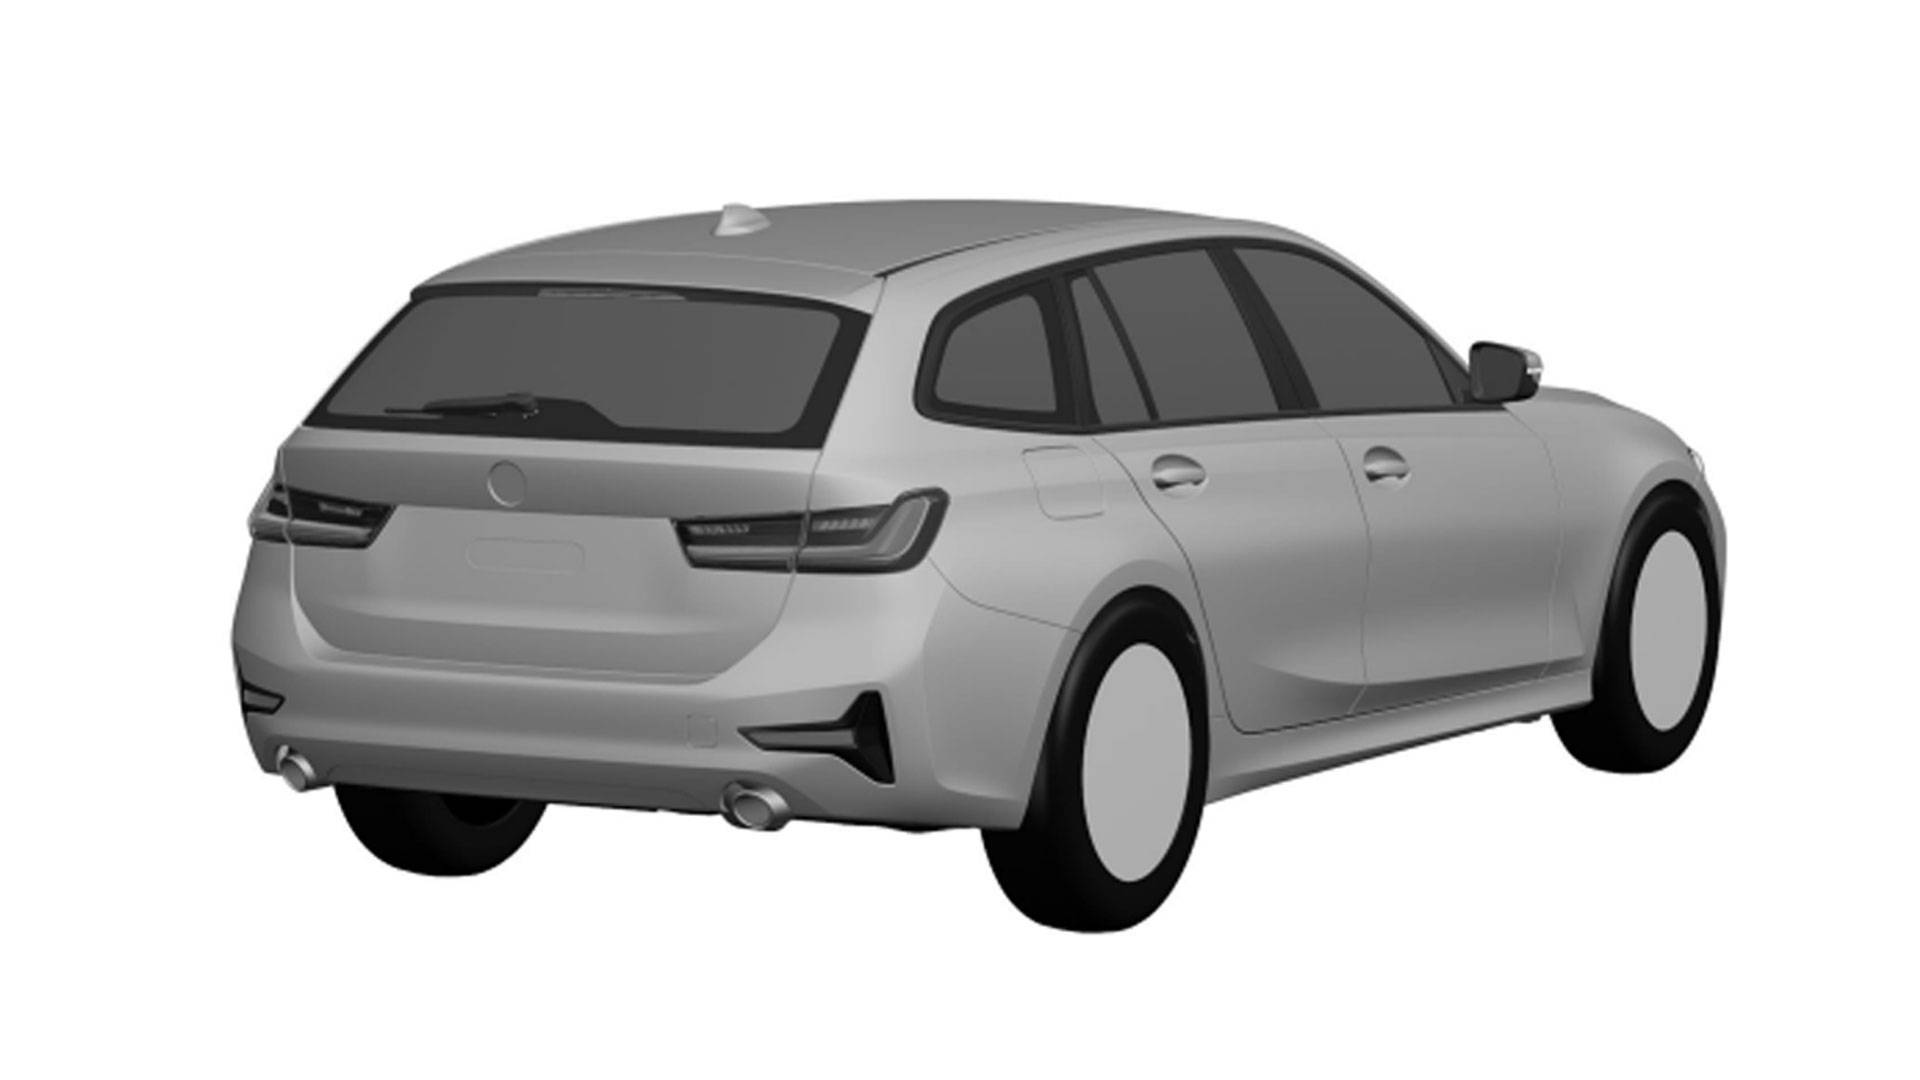 65302243-bmw-3-series-touring-patent-2